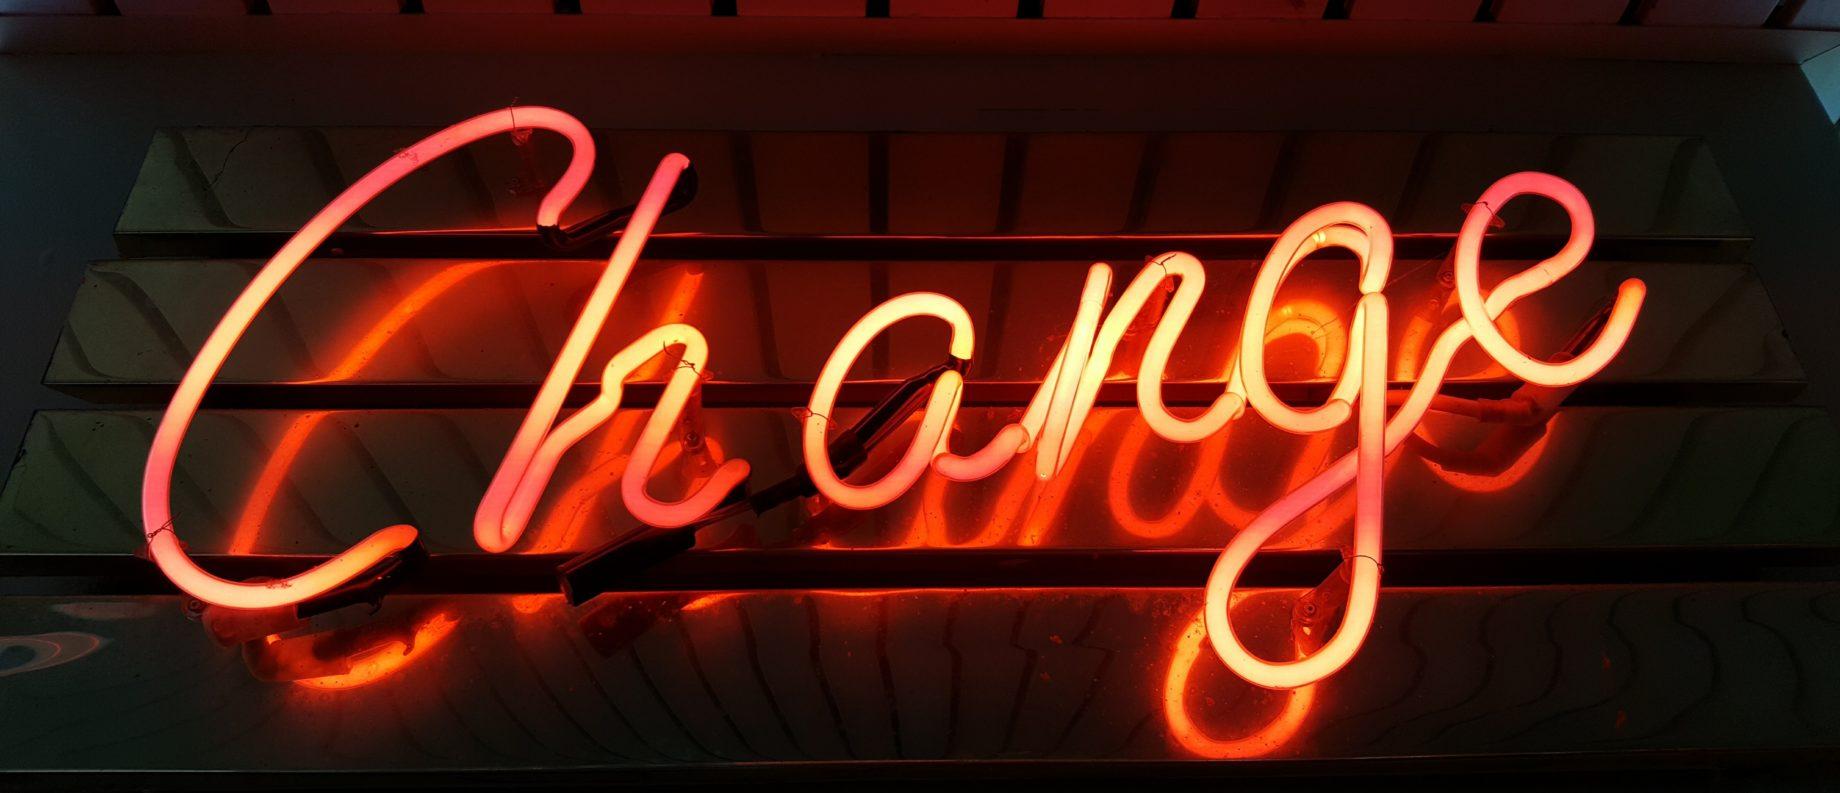 Careers in Social Transformation